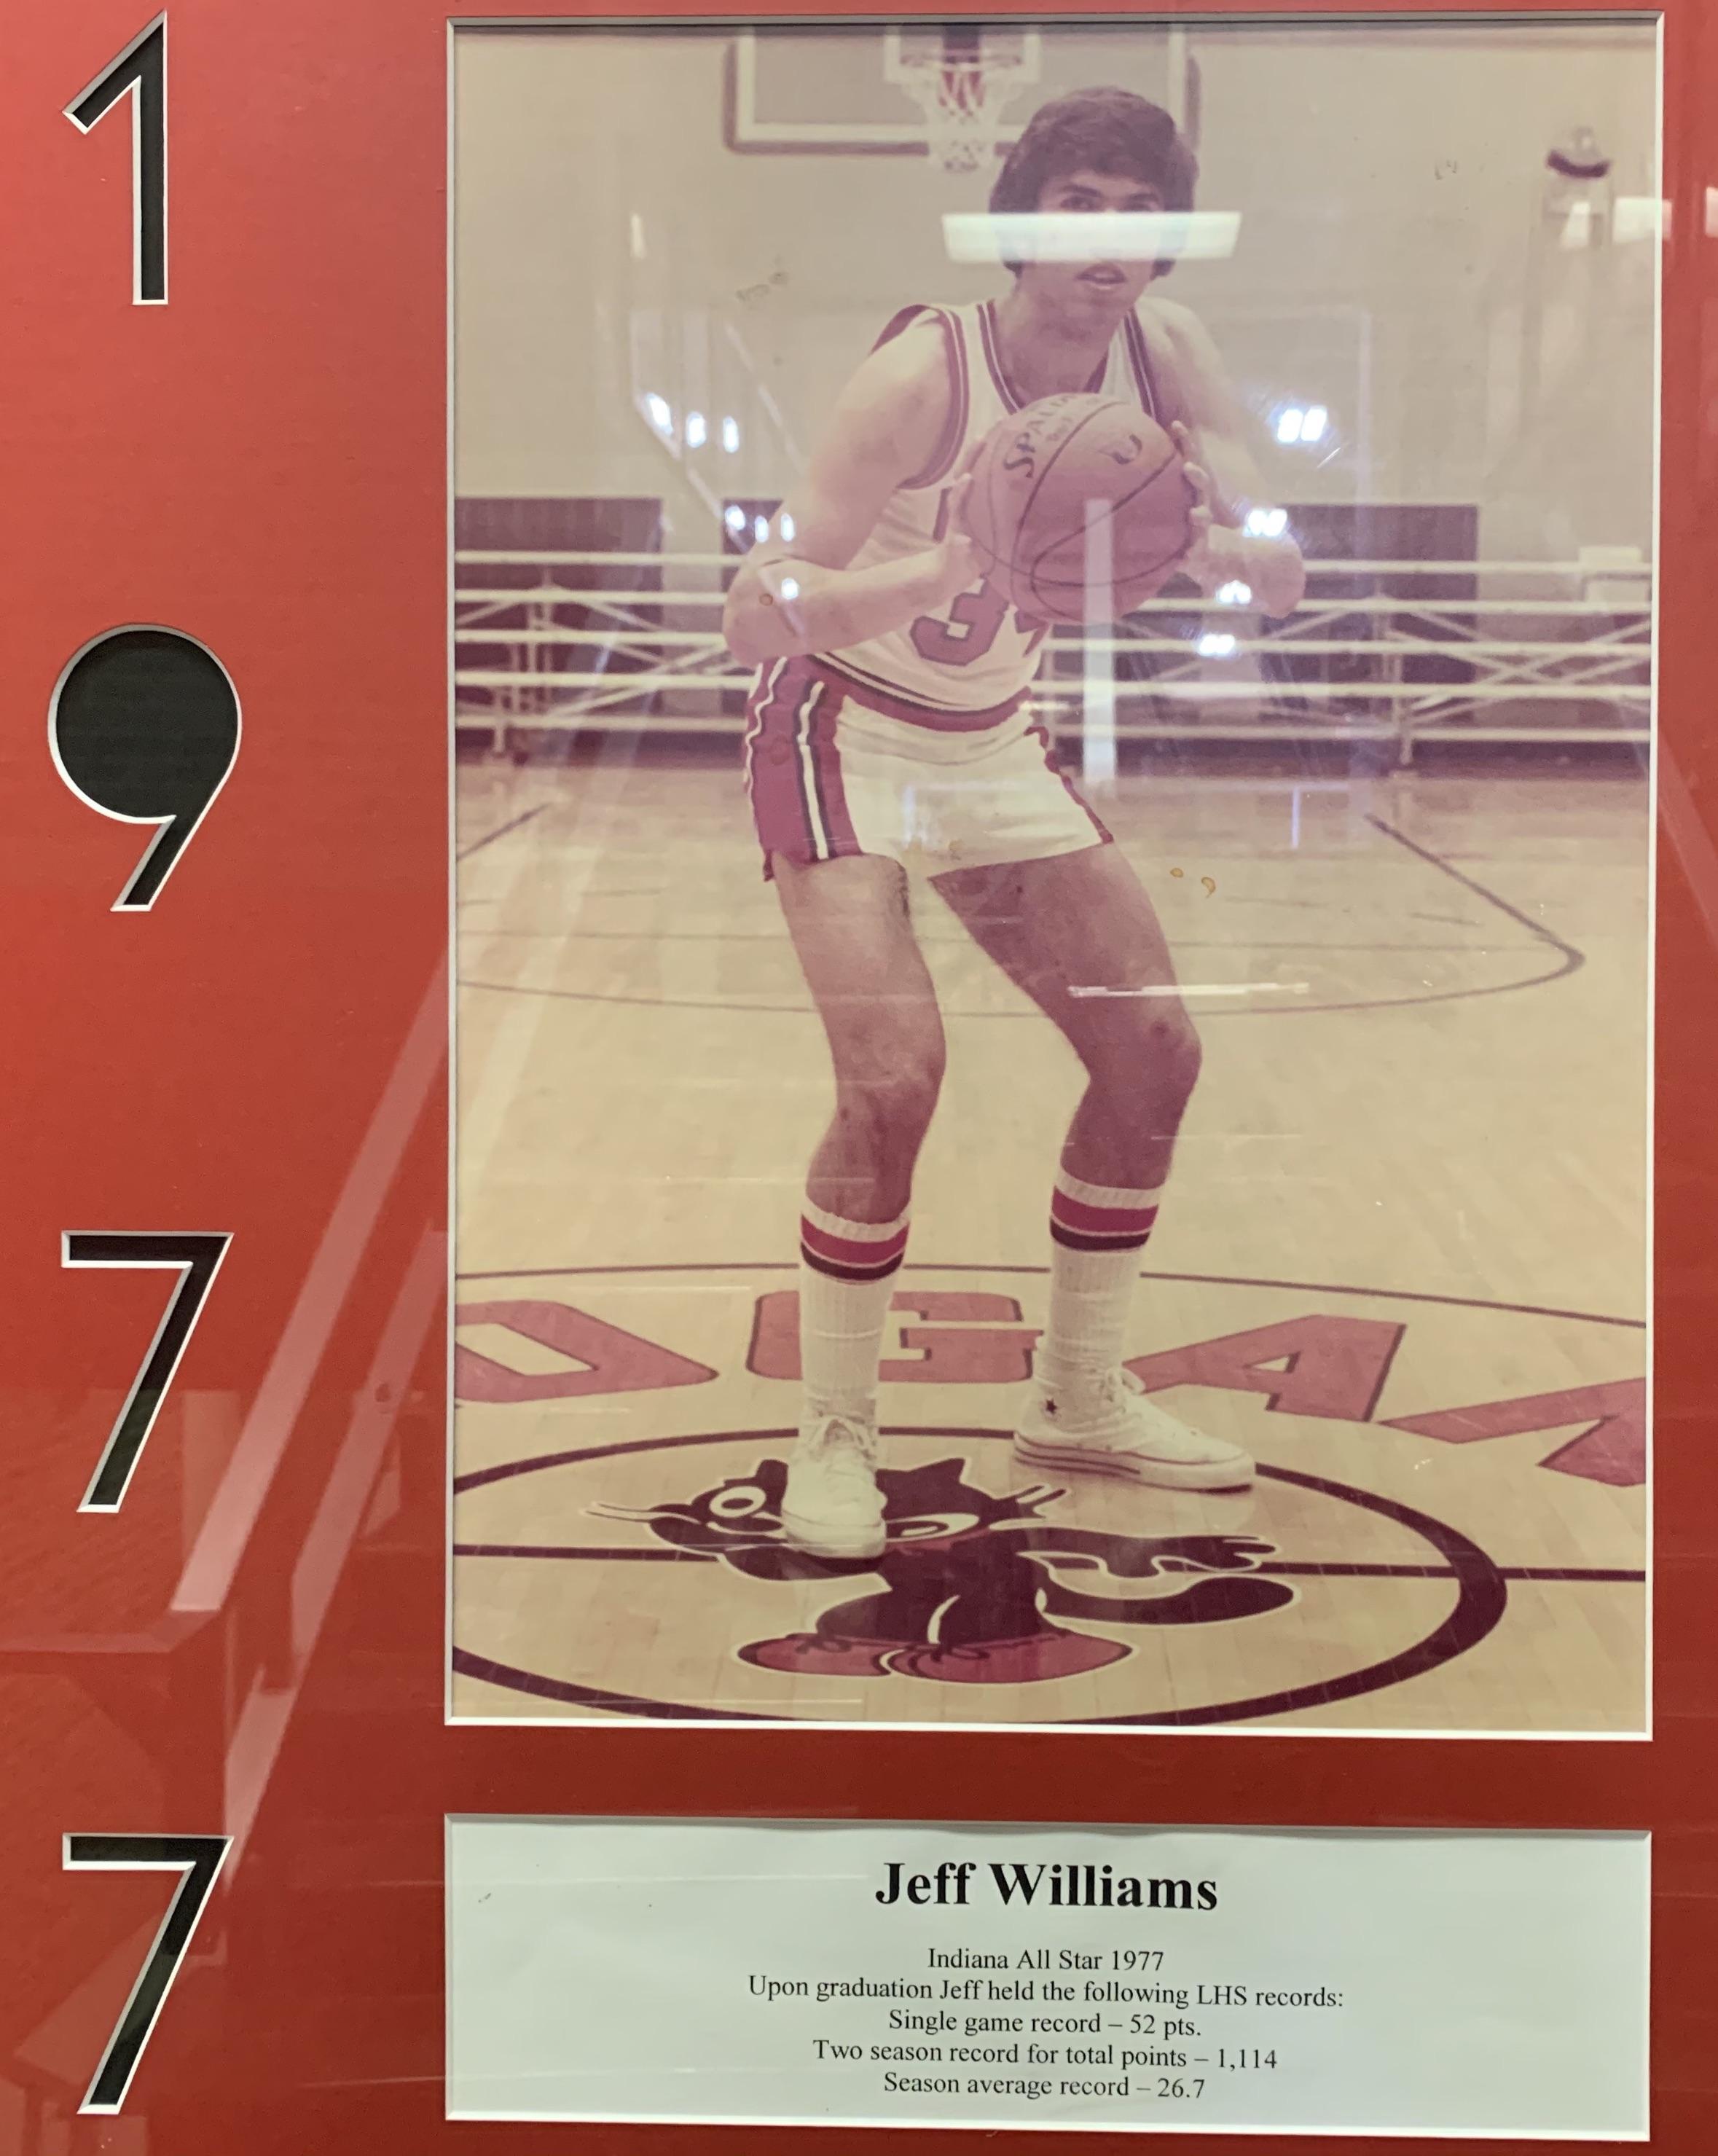 1977 Jeff Williams